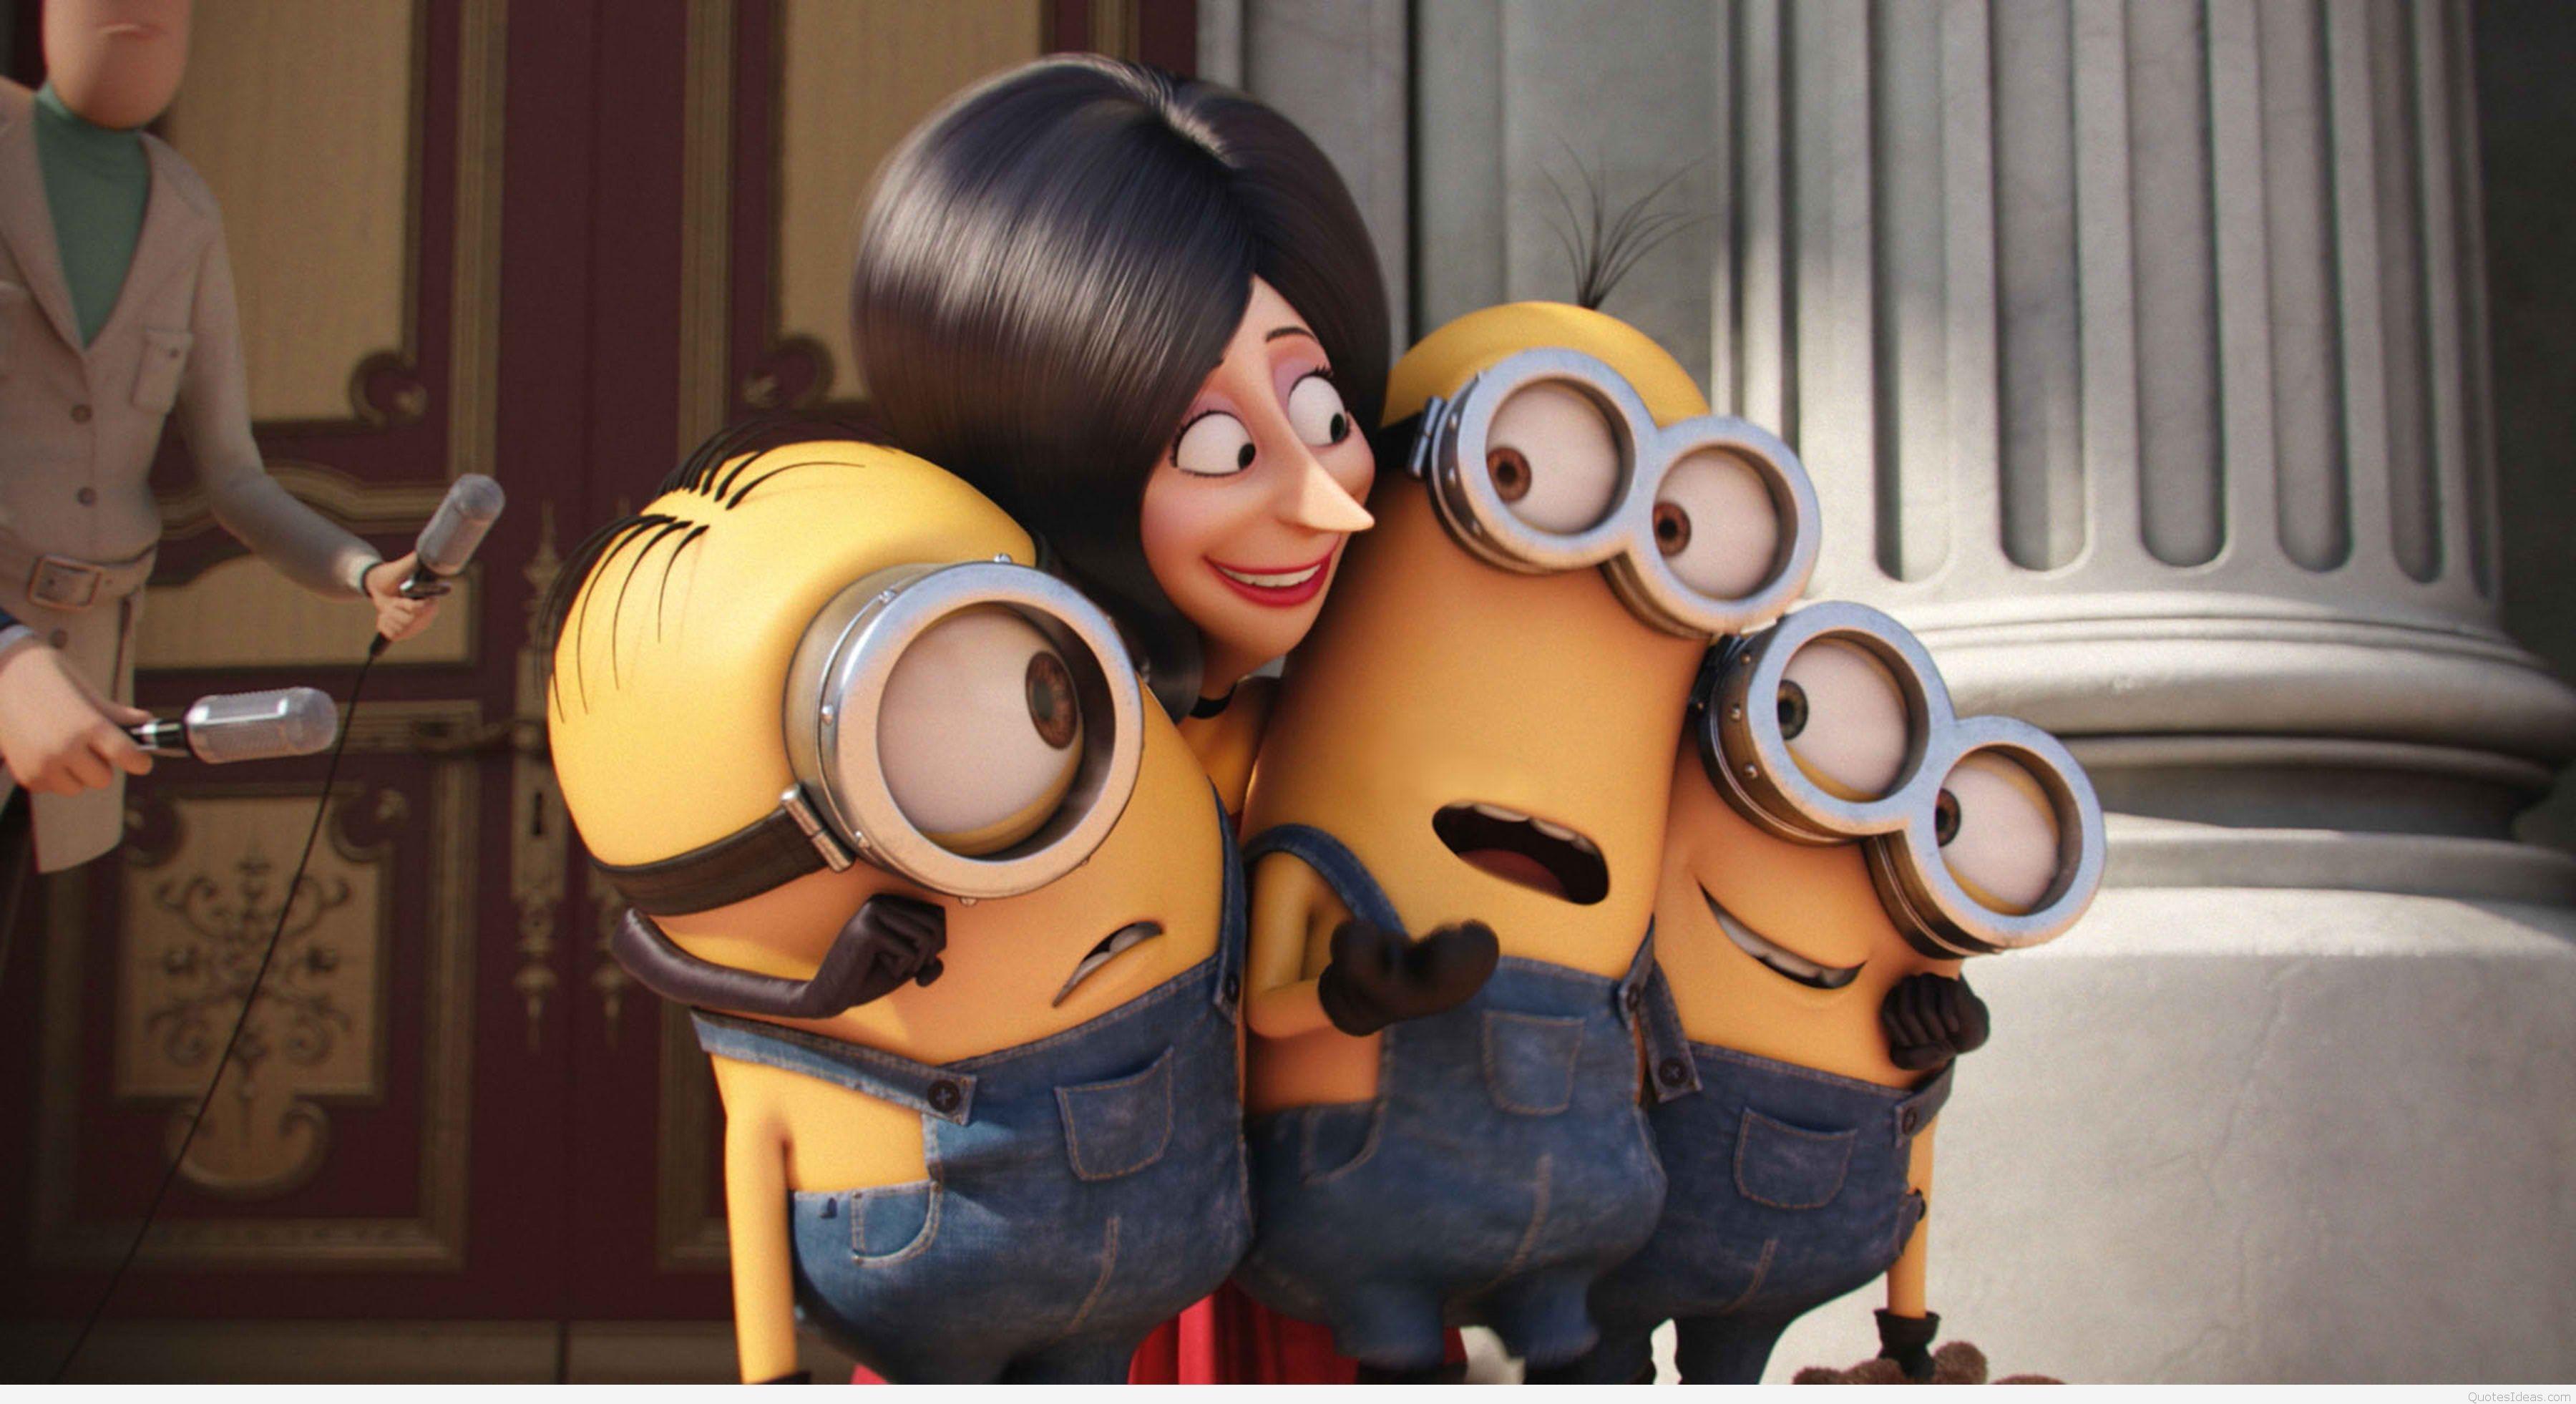 Funny Minions Sandra Bullock